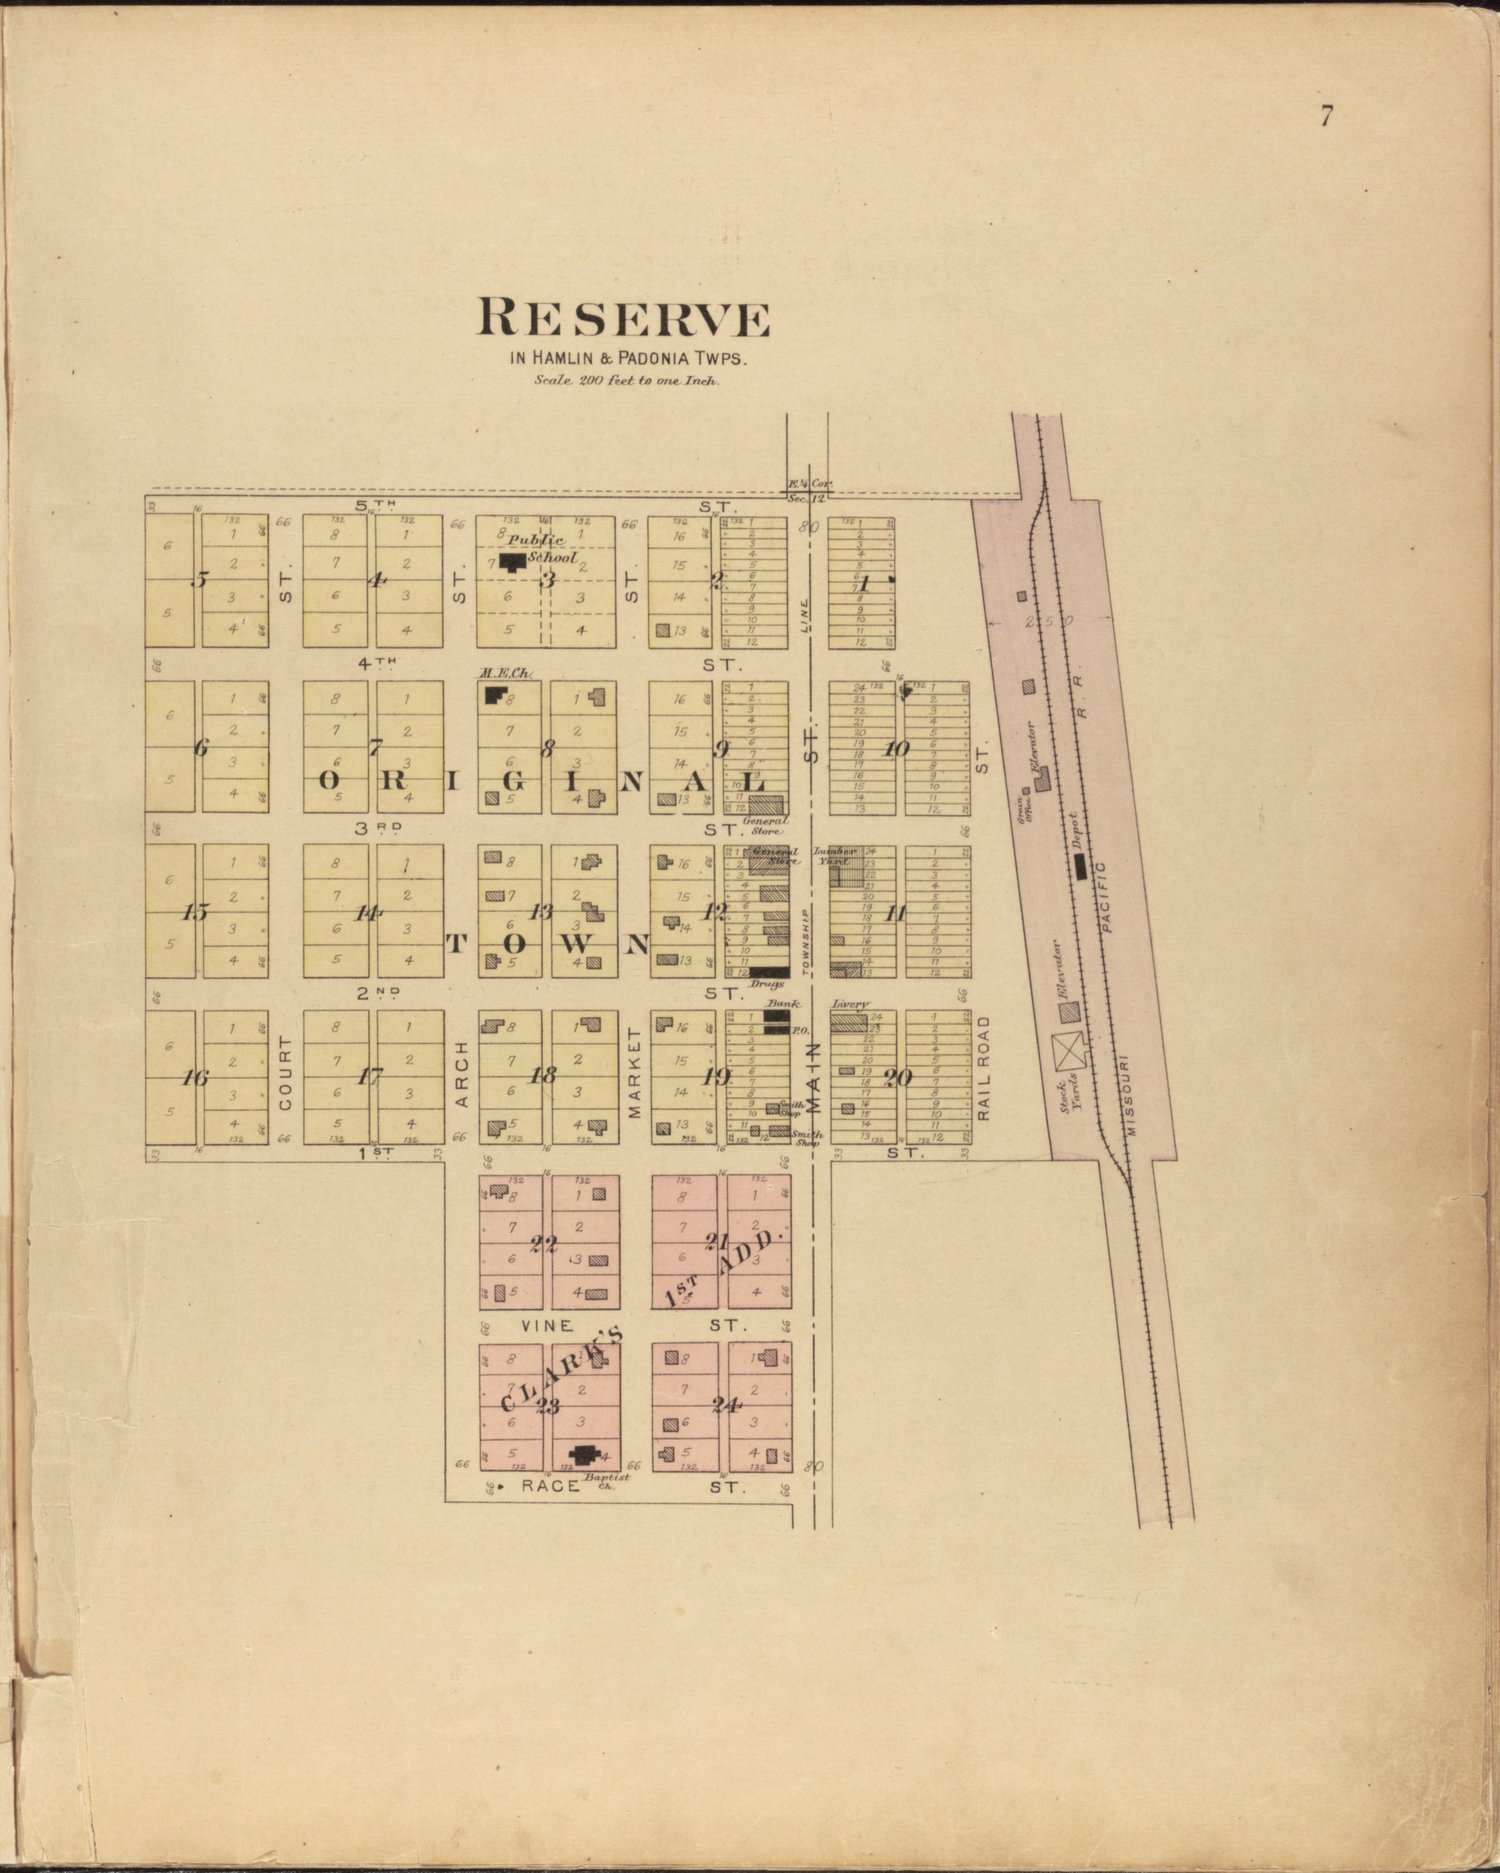 Plat book of Brown County, Kansas - 7